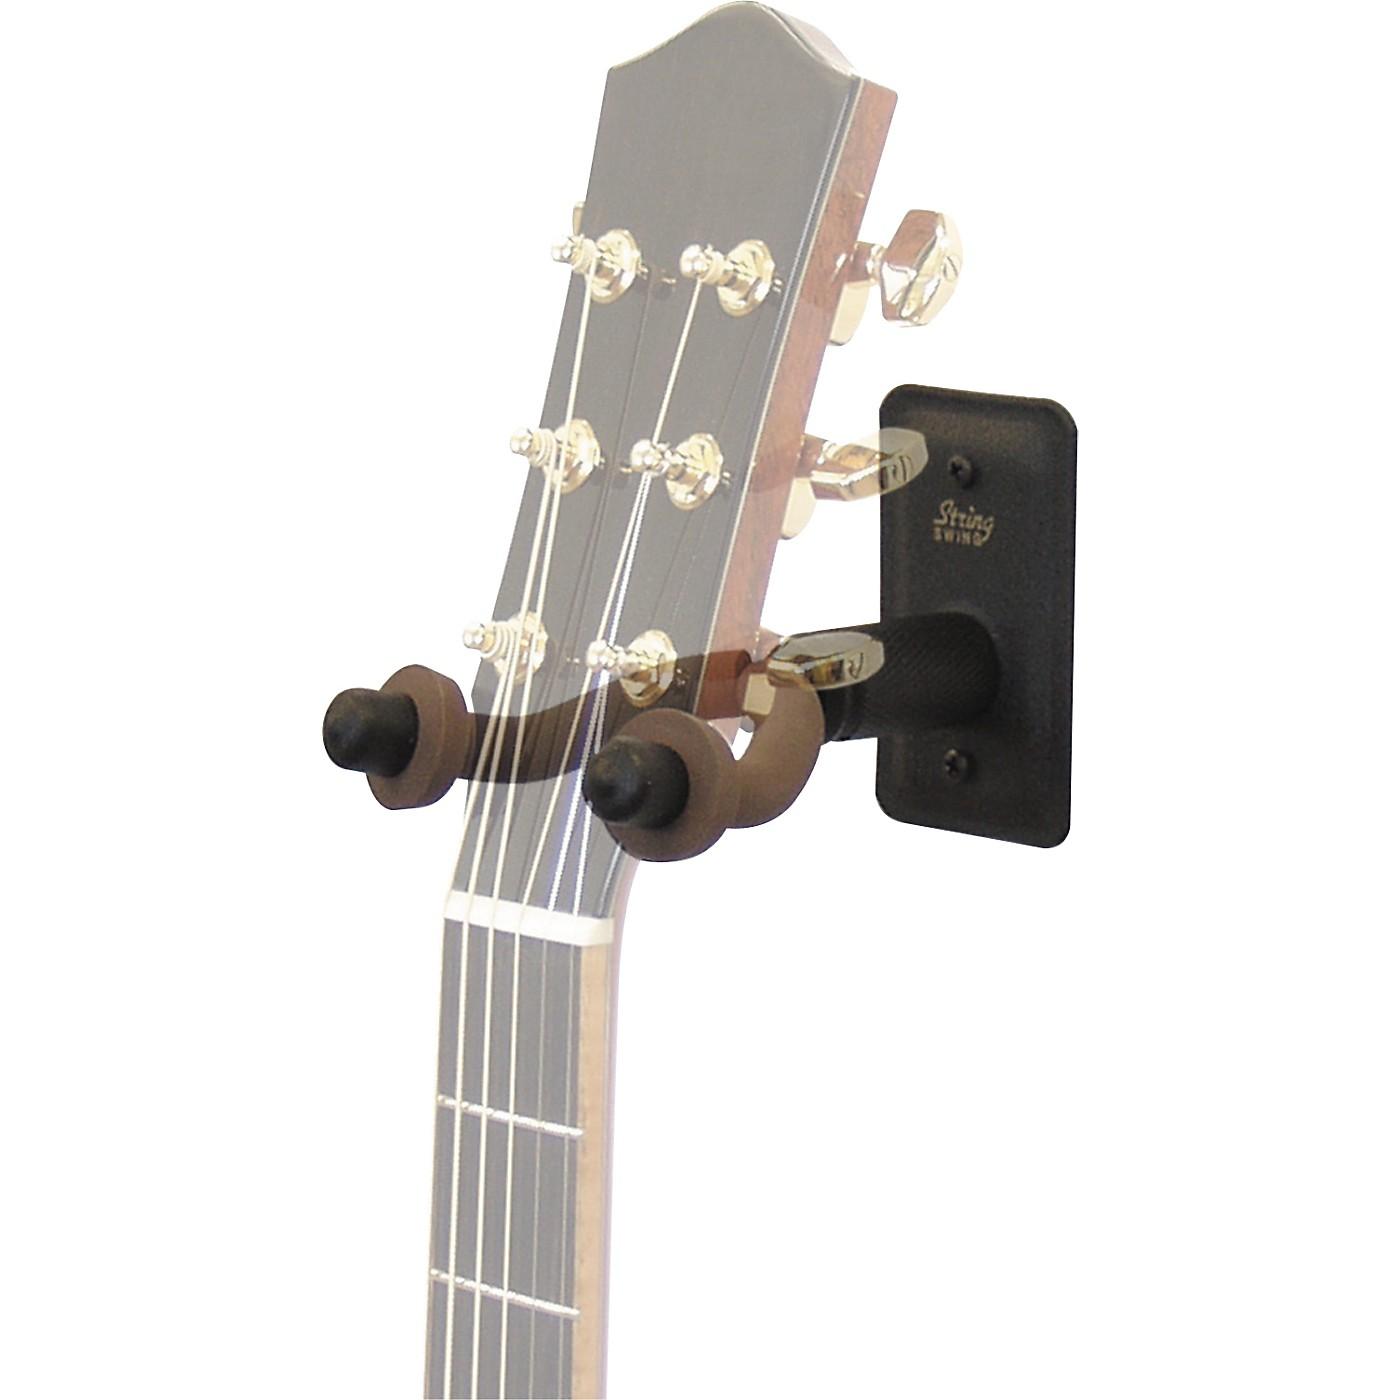 String Swing Metal Guitar Wall Hanger w/ Wall Bumper thumbnail